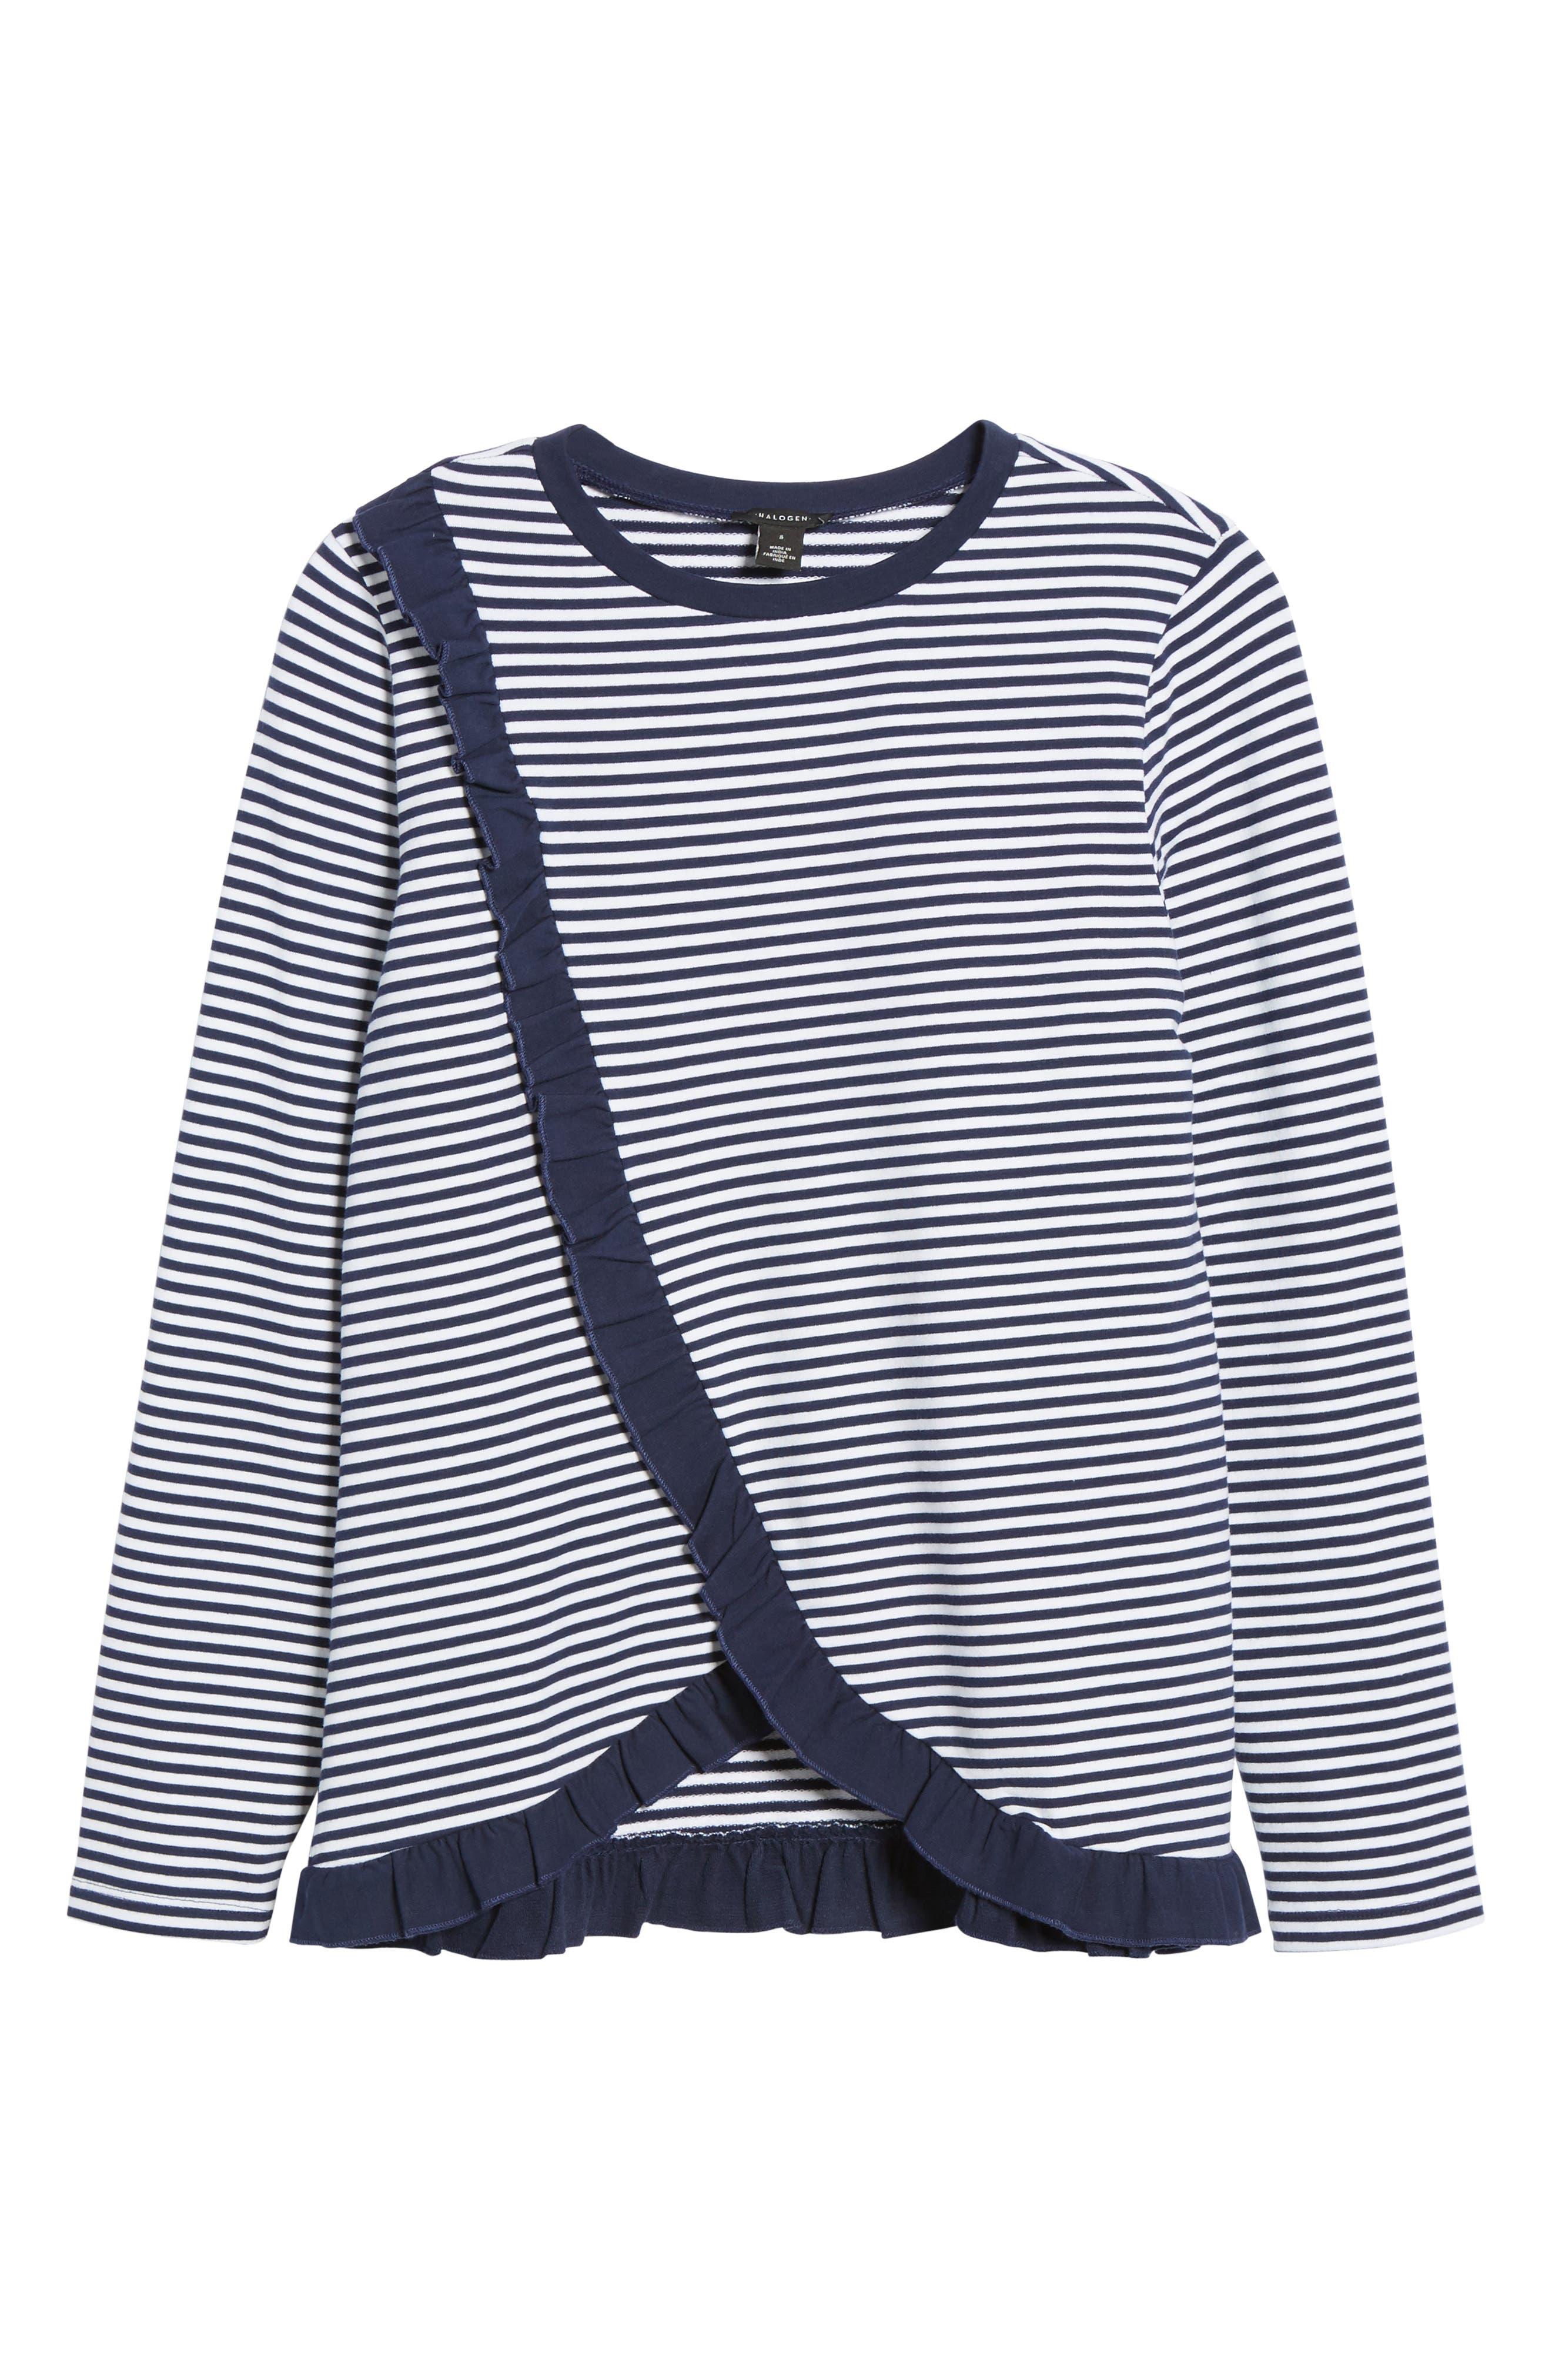 Ruffle Wrap Top,                         Main,                         color, Navy- White Stripe